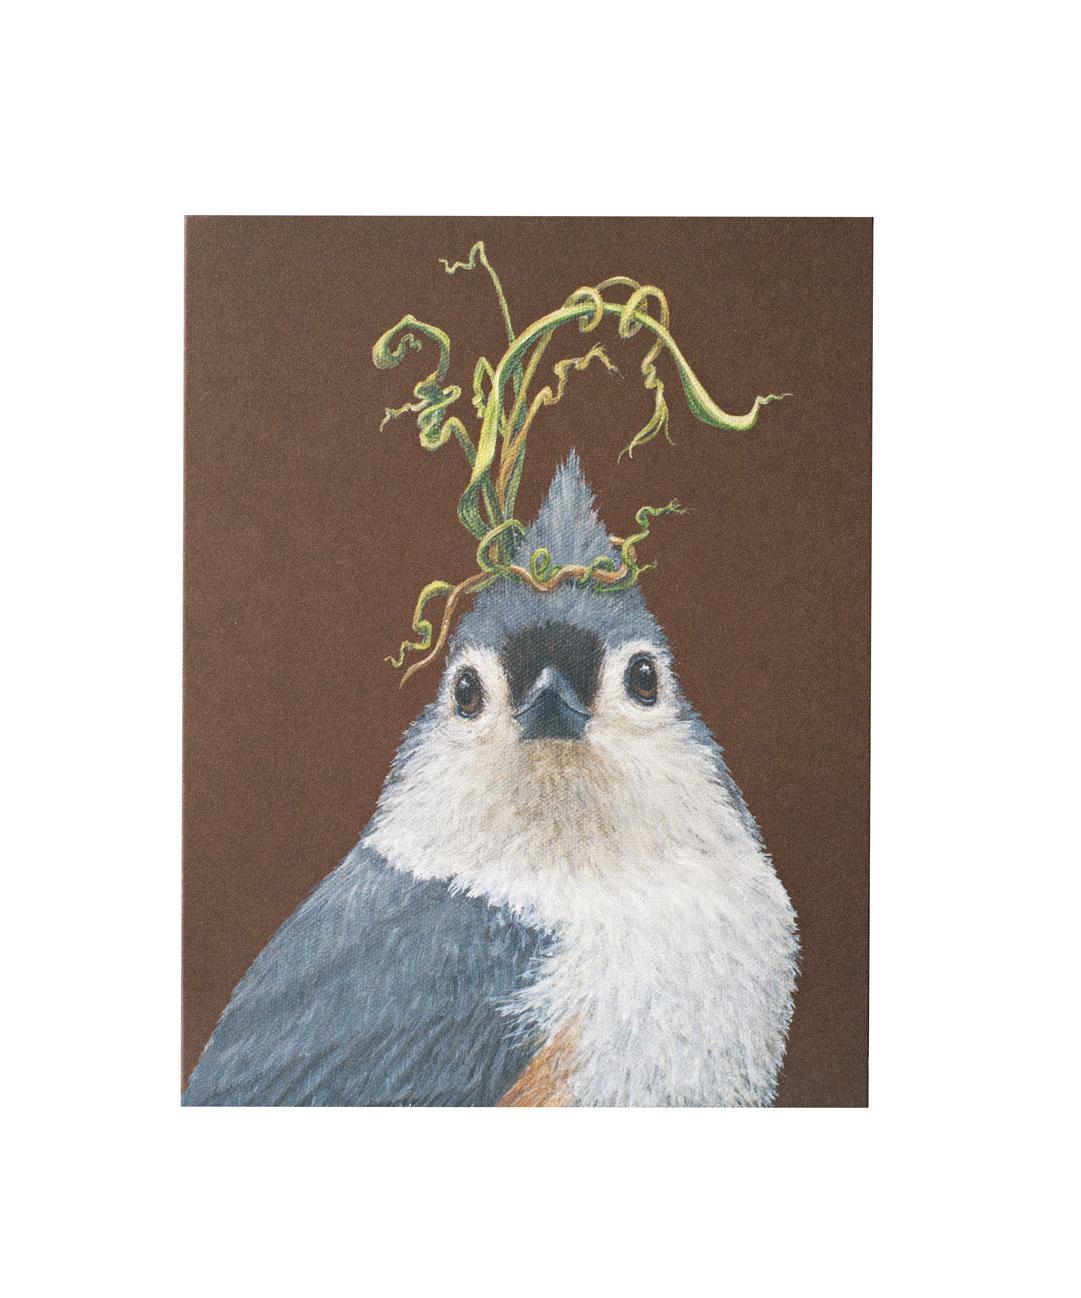 Tufted Titmouse Card